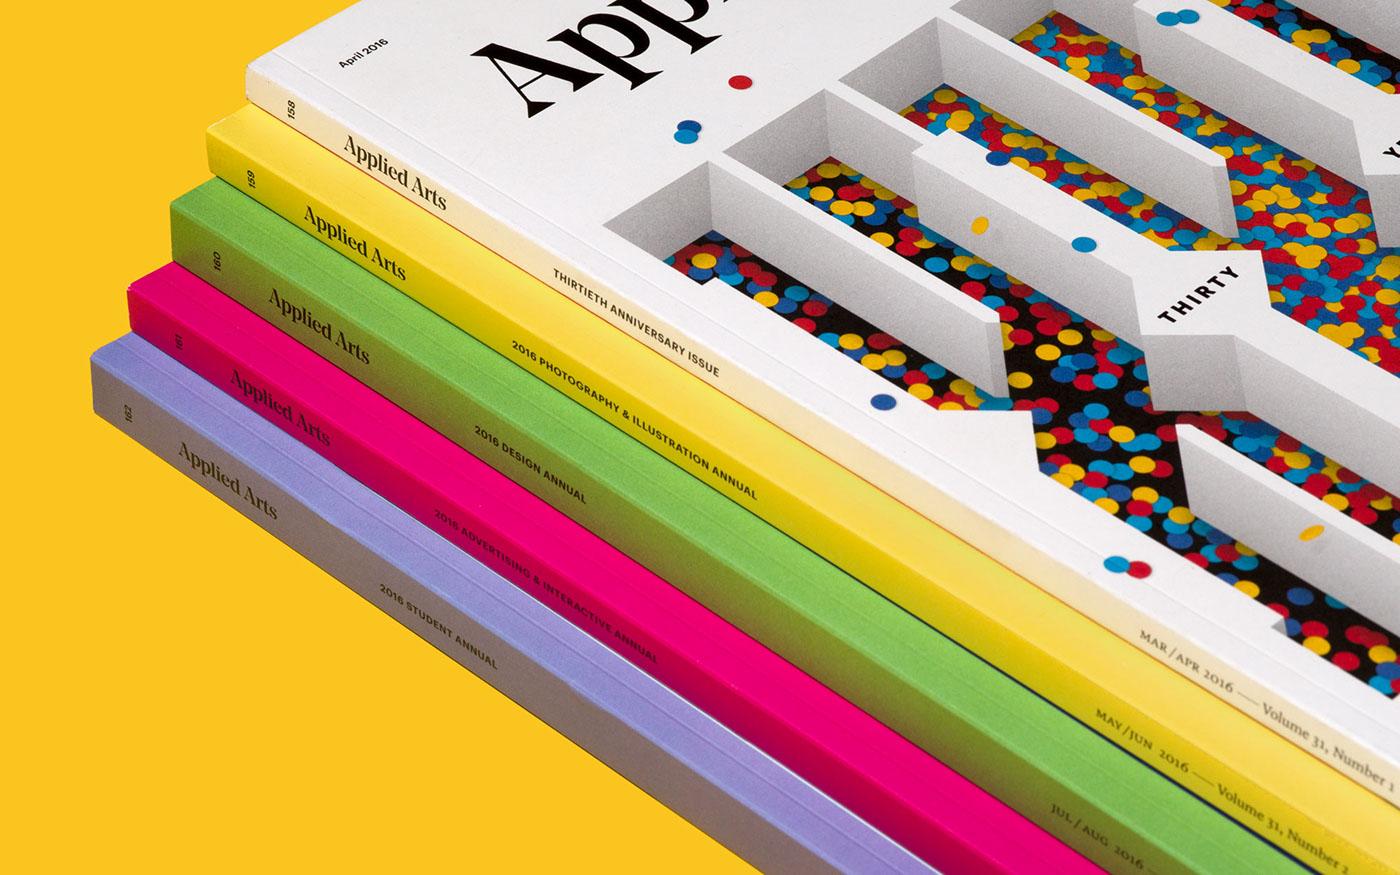 Magazine design,editorial design ,Magazine Redesign,applied arts,Visual Communications,creative magazine